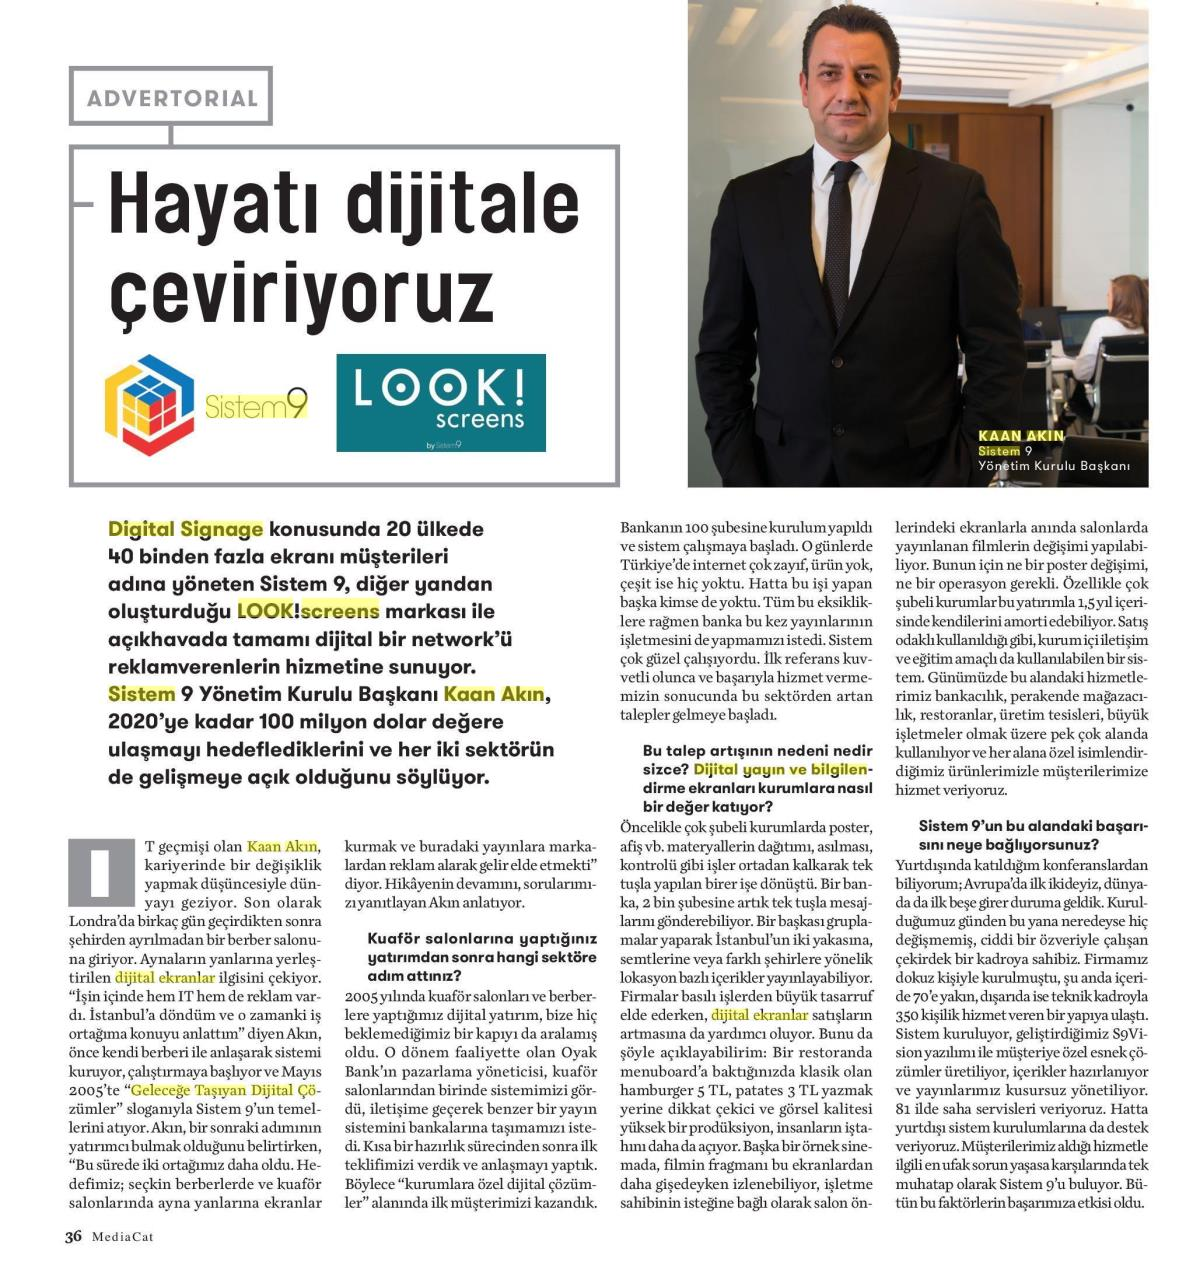 mediacateylul1